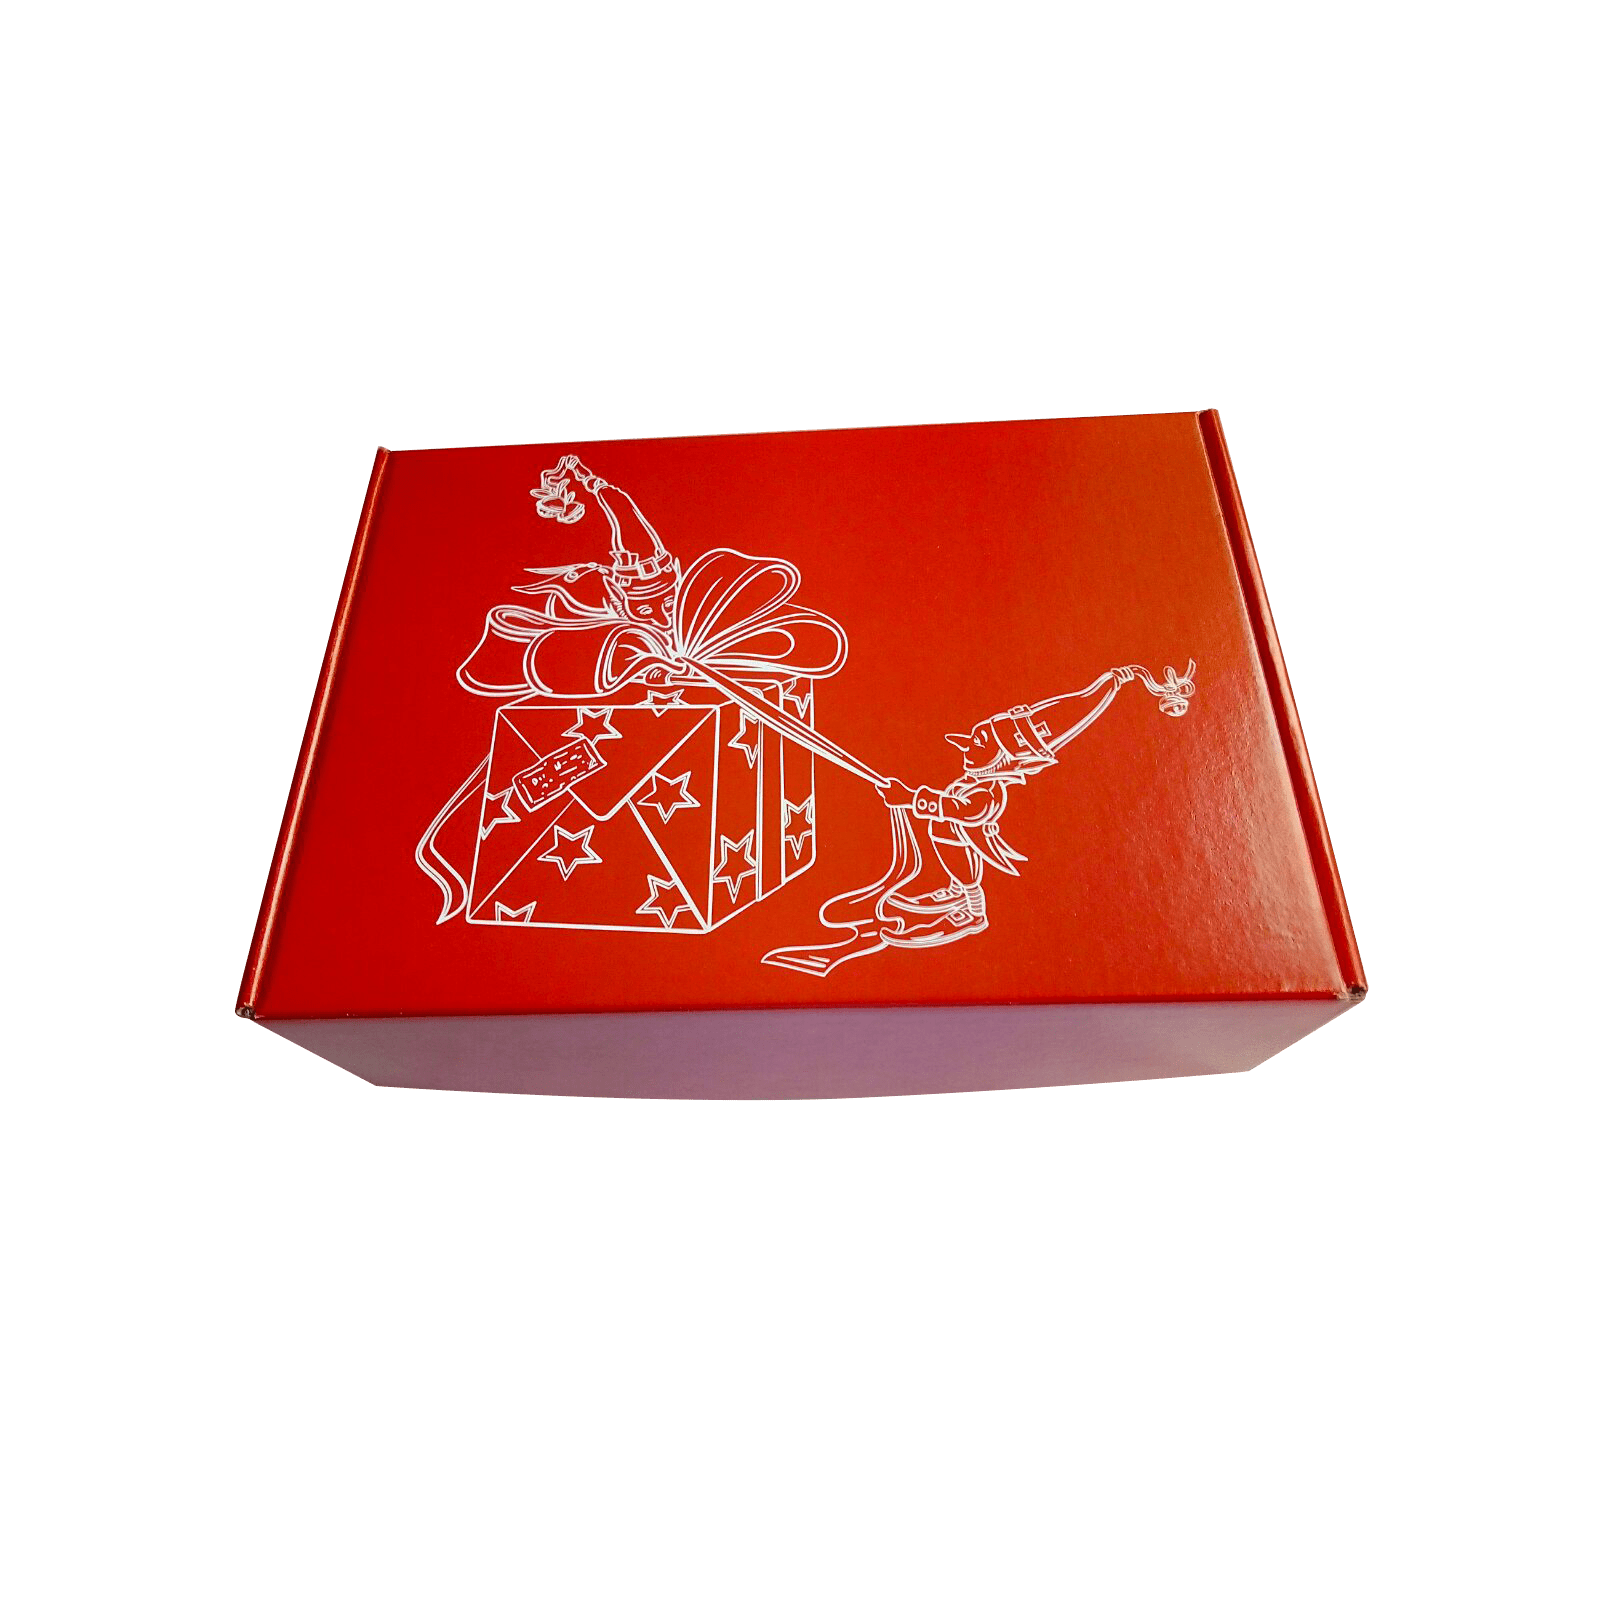 Флексографічний друк коробка